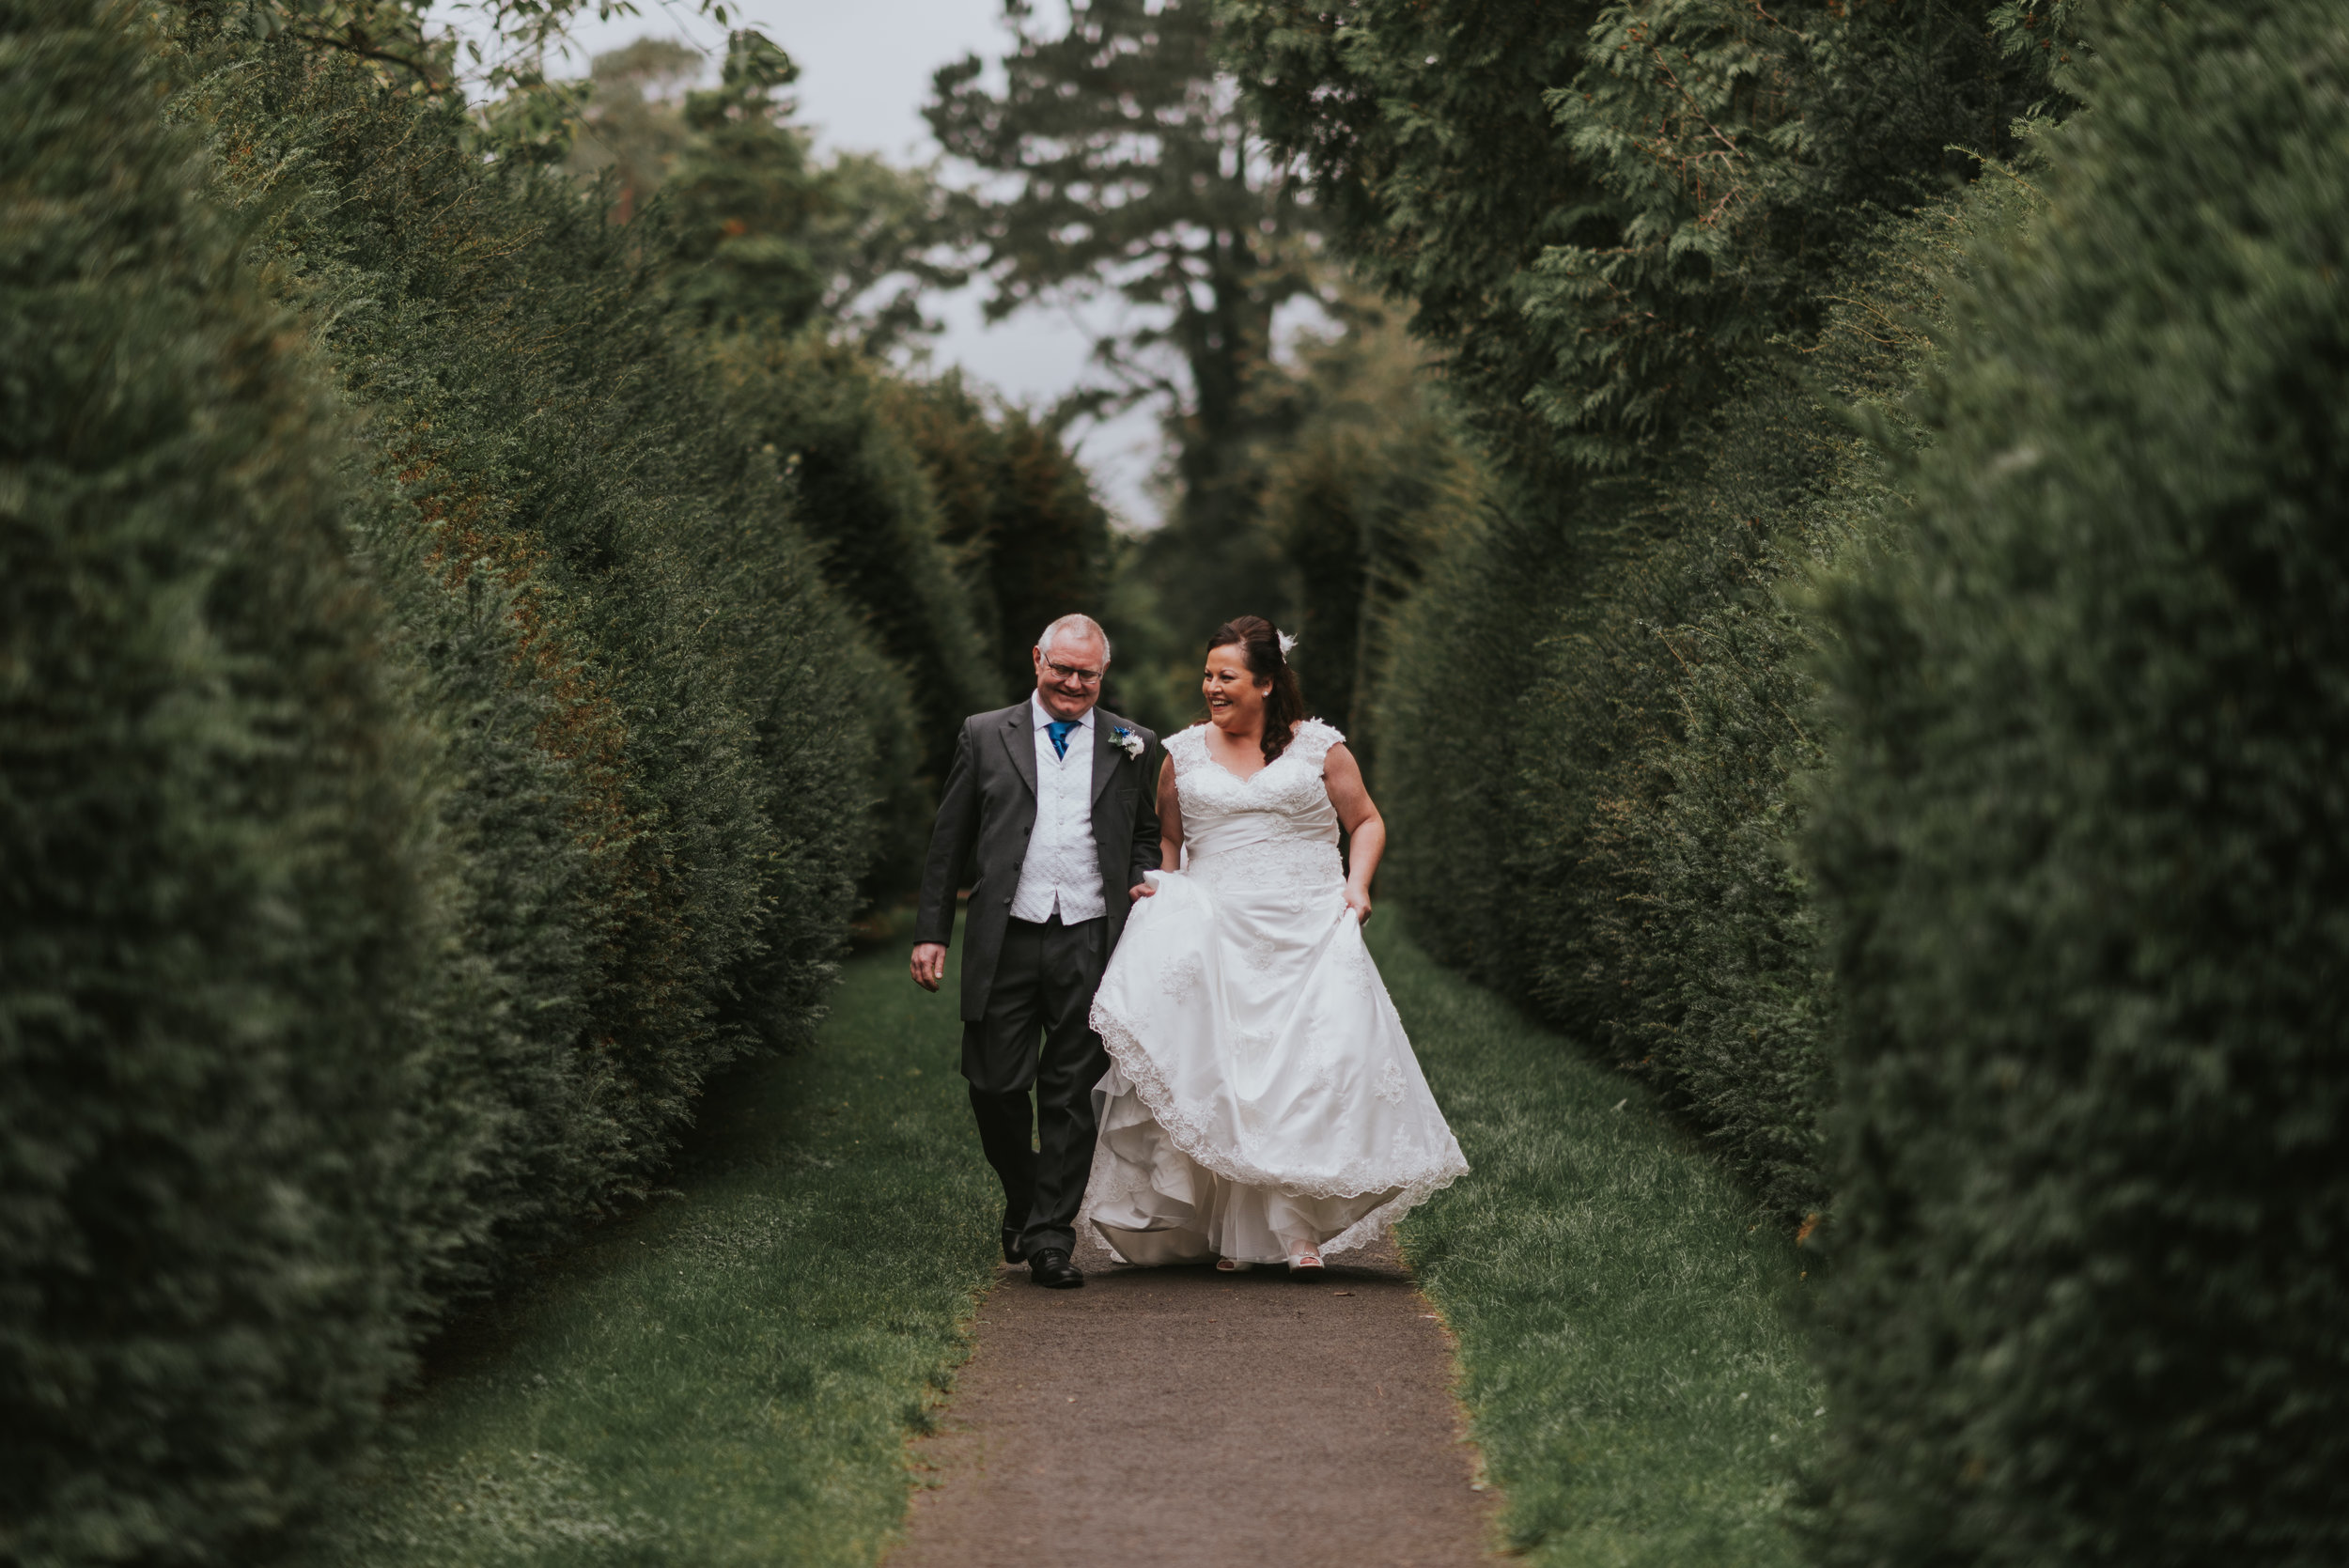 Lady dixon park belfast wedding photographer pure photo n.i portraits bride and groom